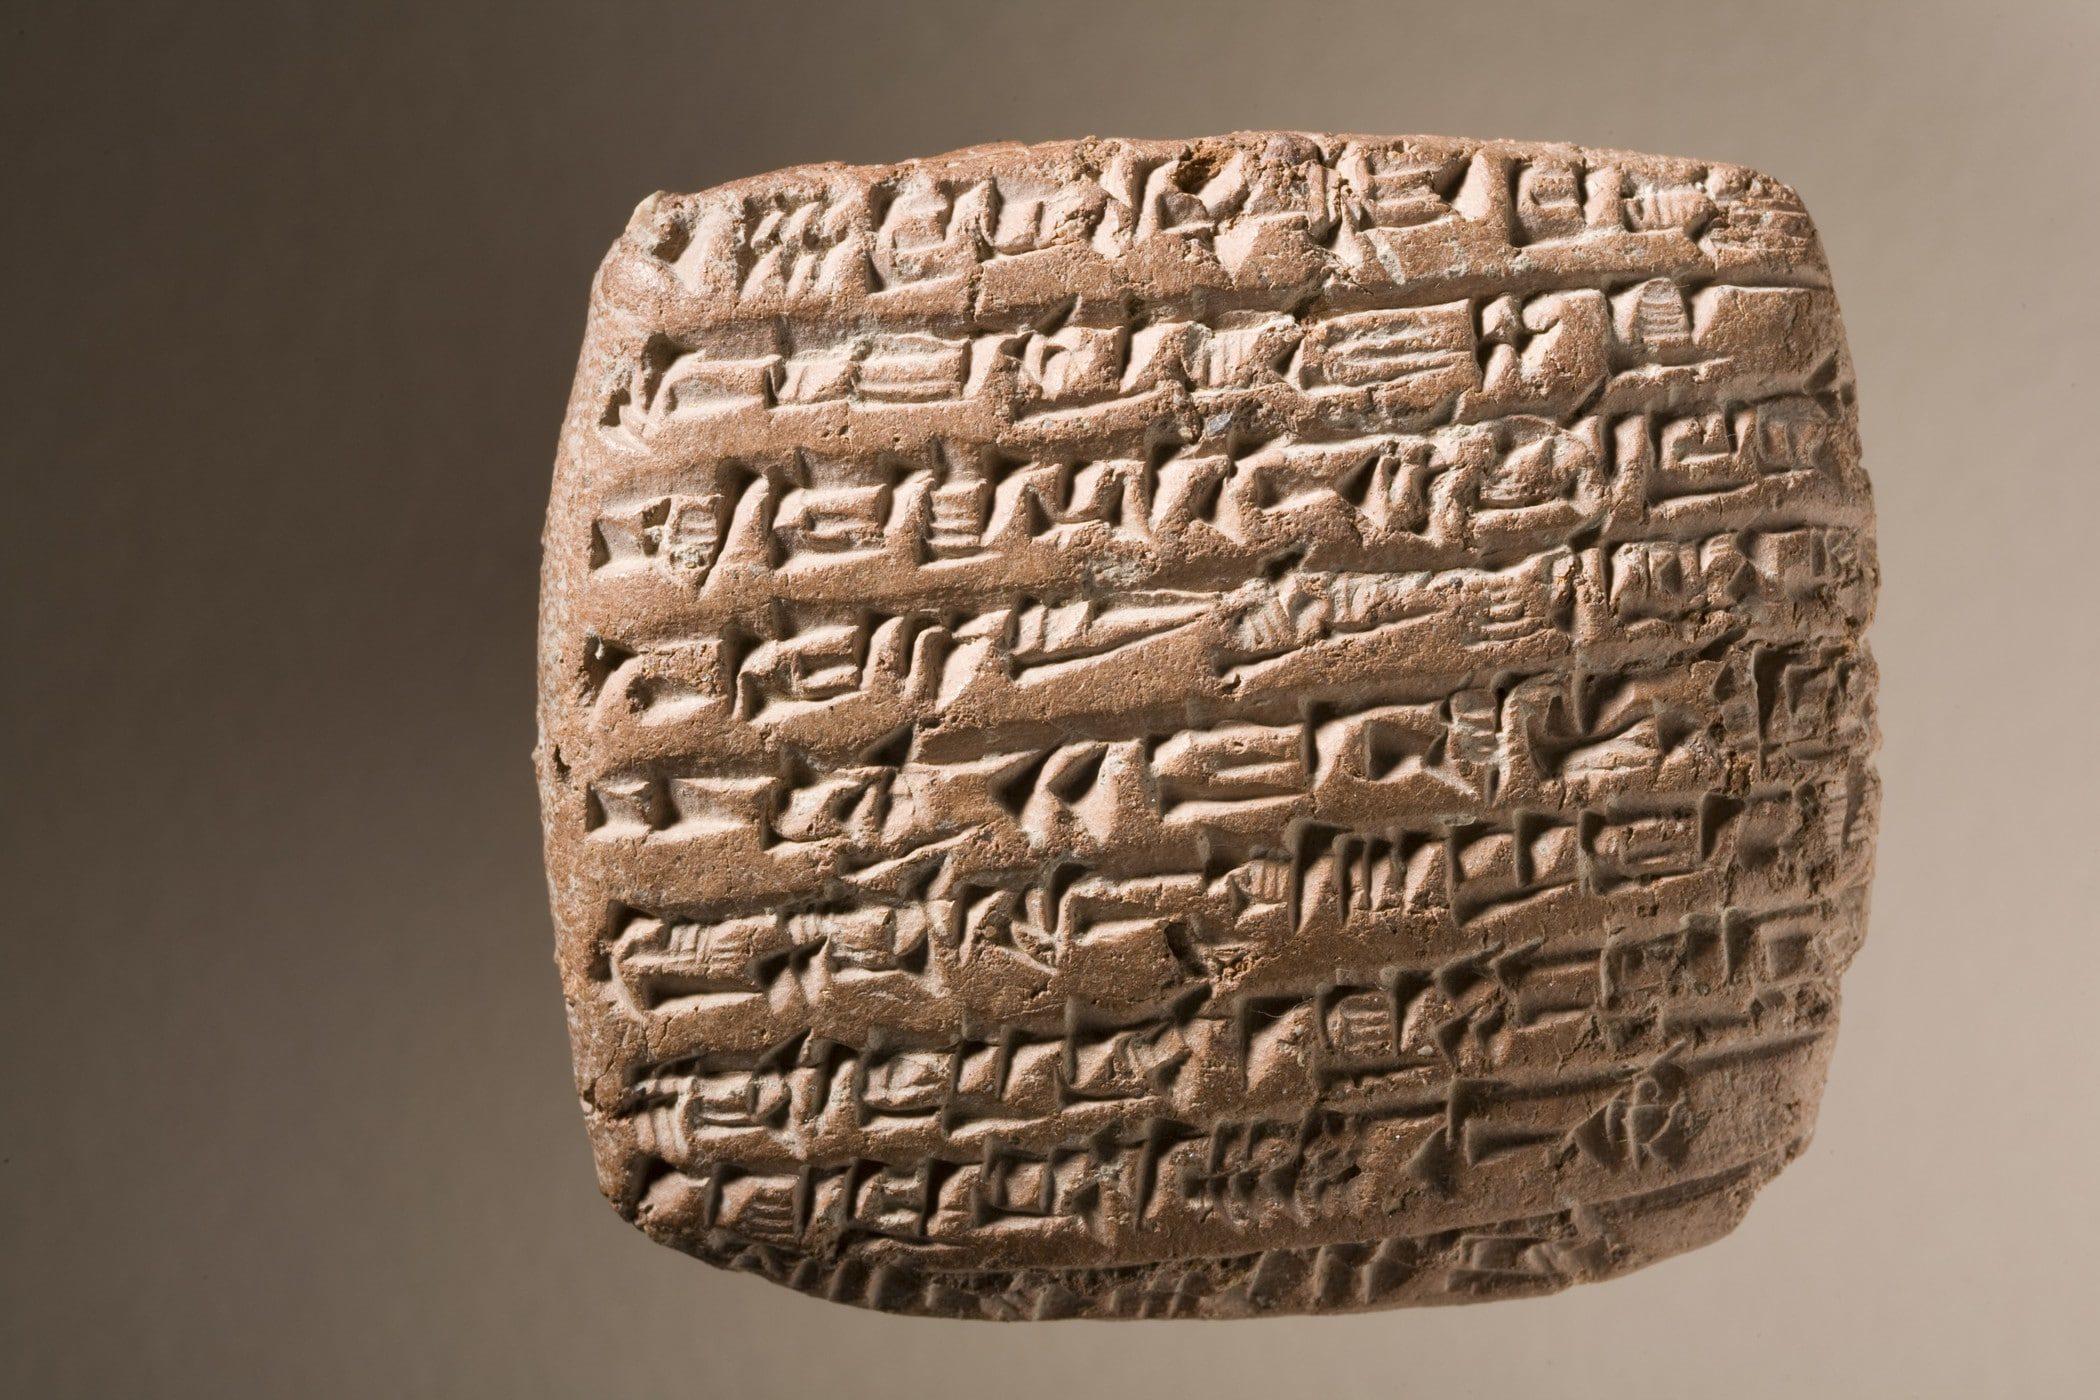 Cuneiform clay tablets